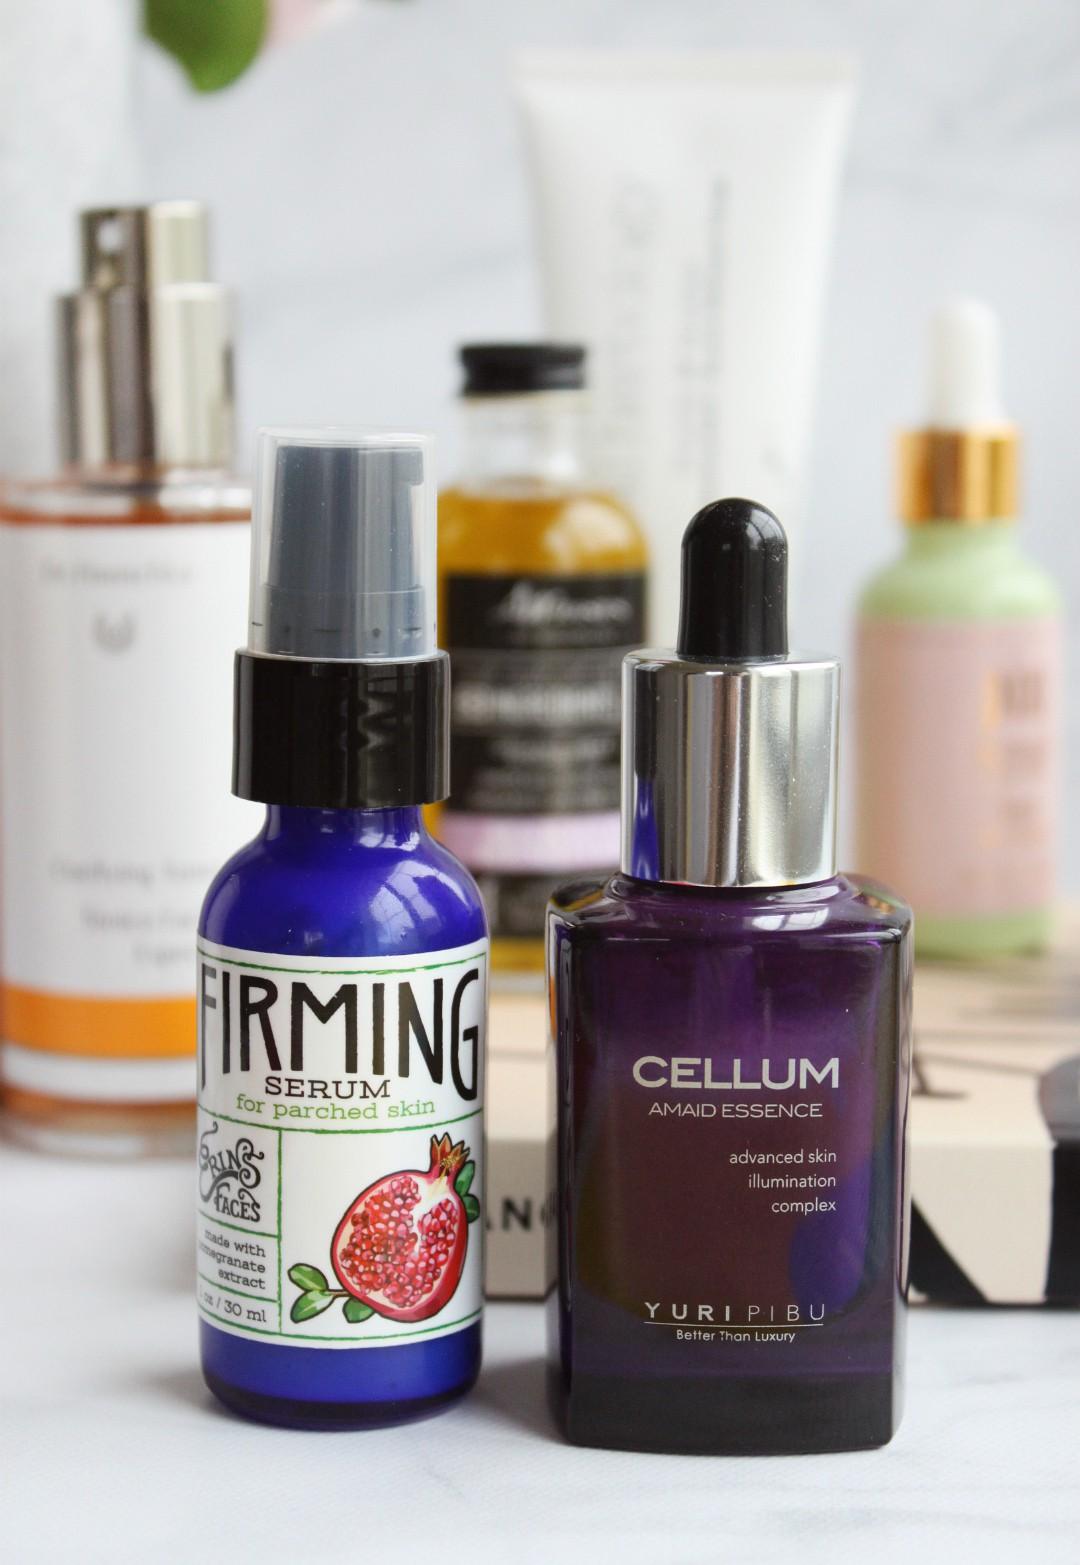 Clean, Natural, Non-Toxic Skincare Routine (Evening) | Erin's Faces Firming Serum, Yuri Pibu Cellum Amaid Essence